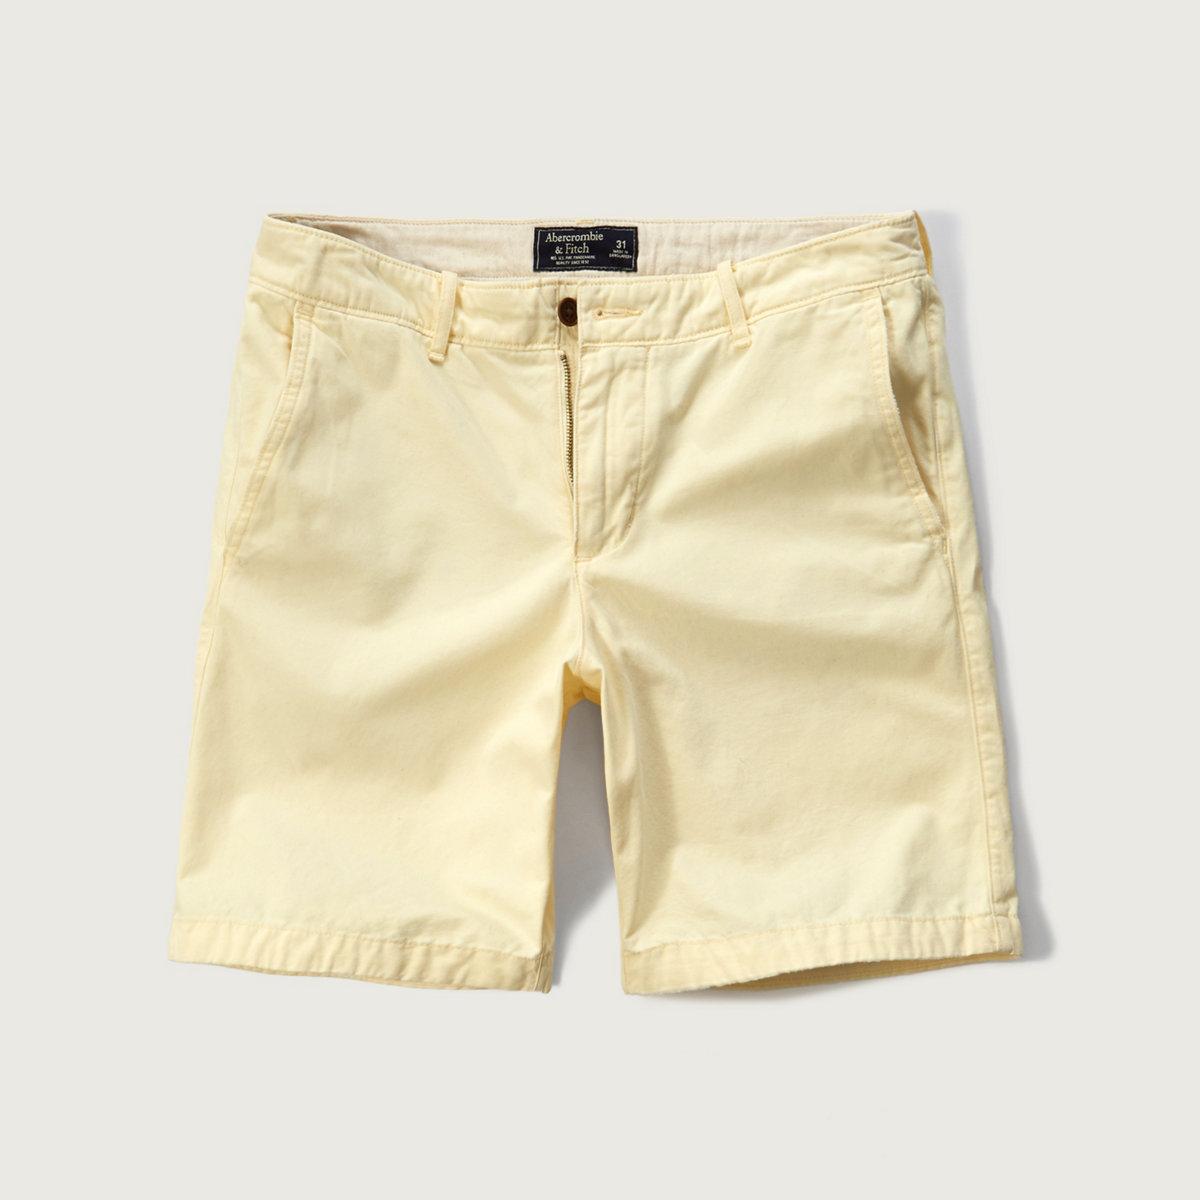 Classic Fit Shorts